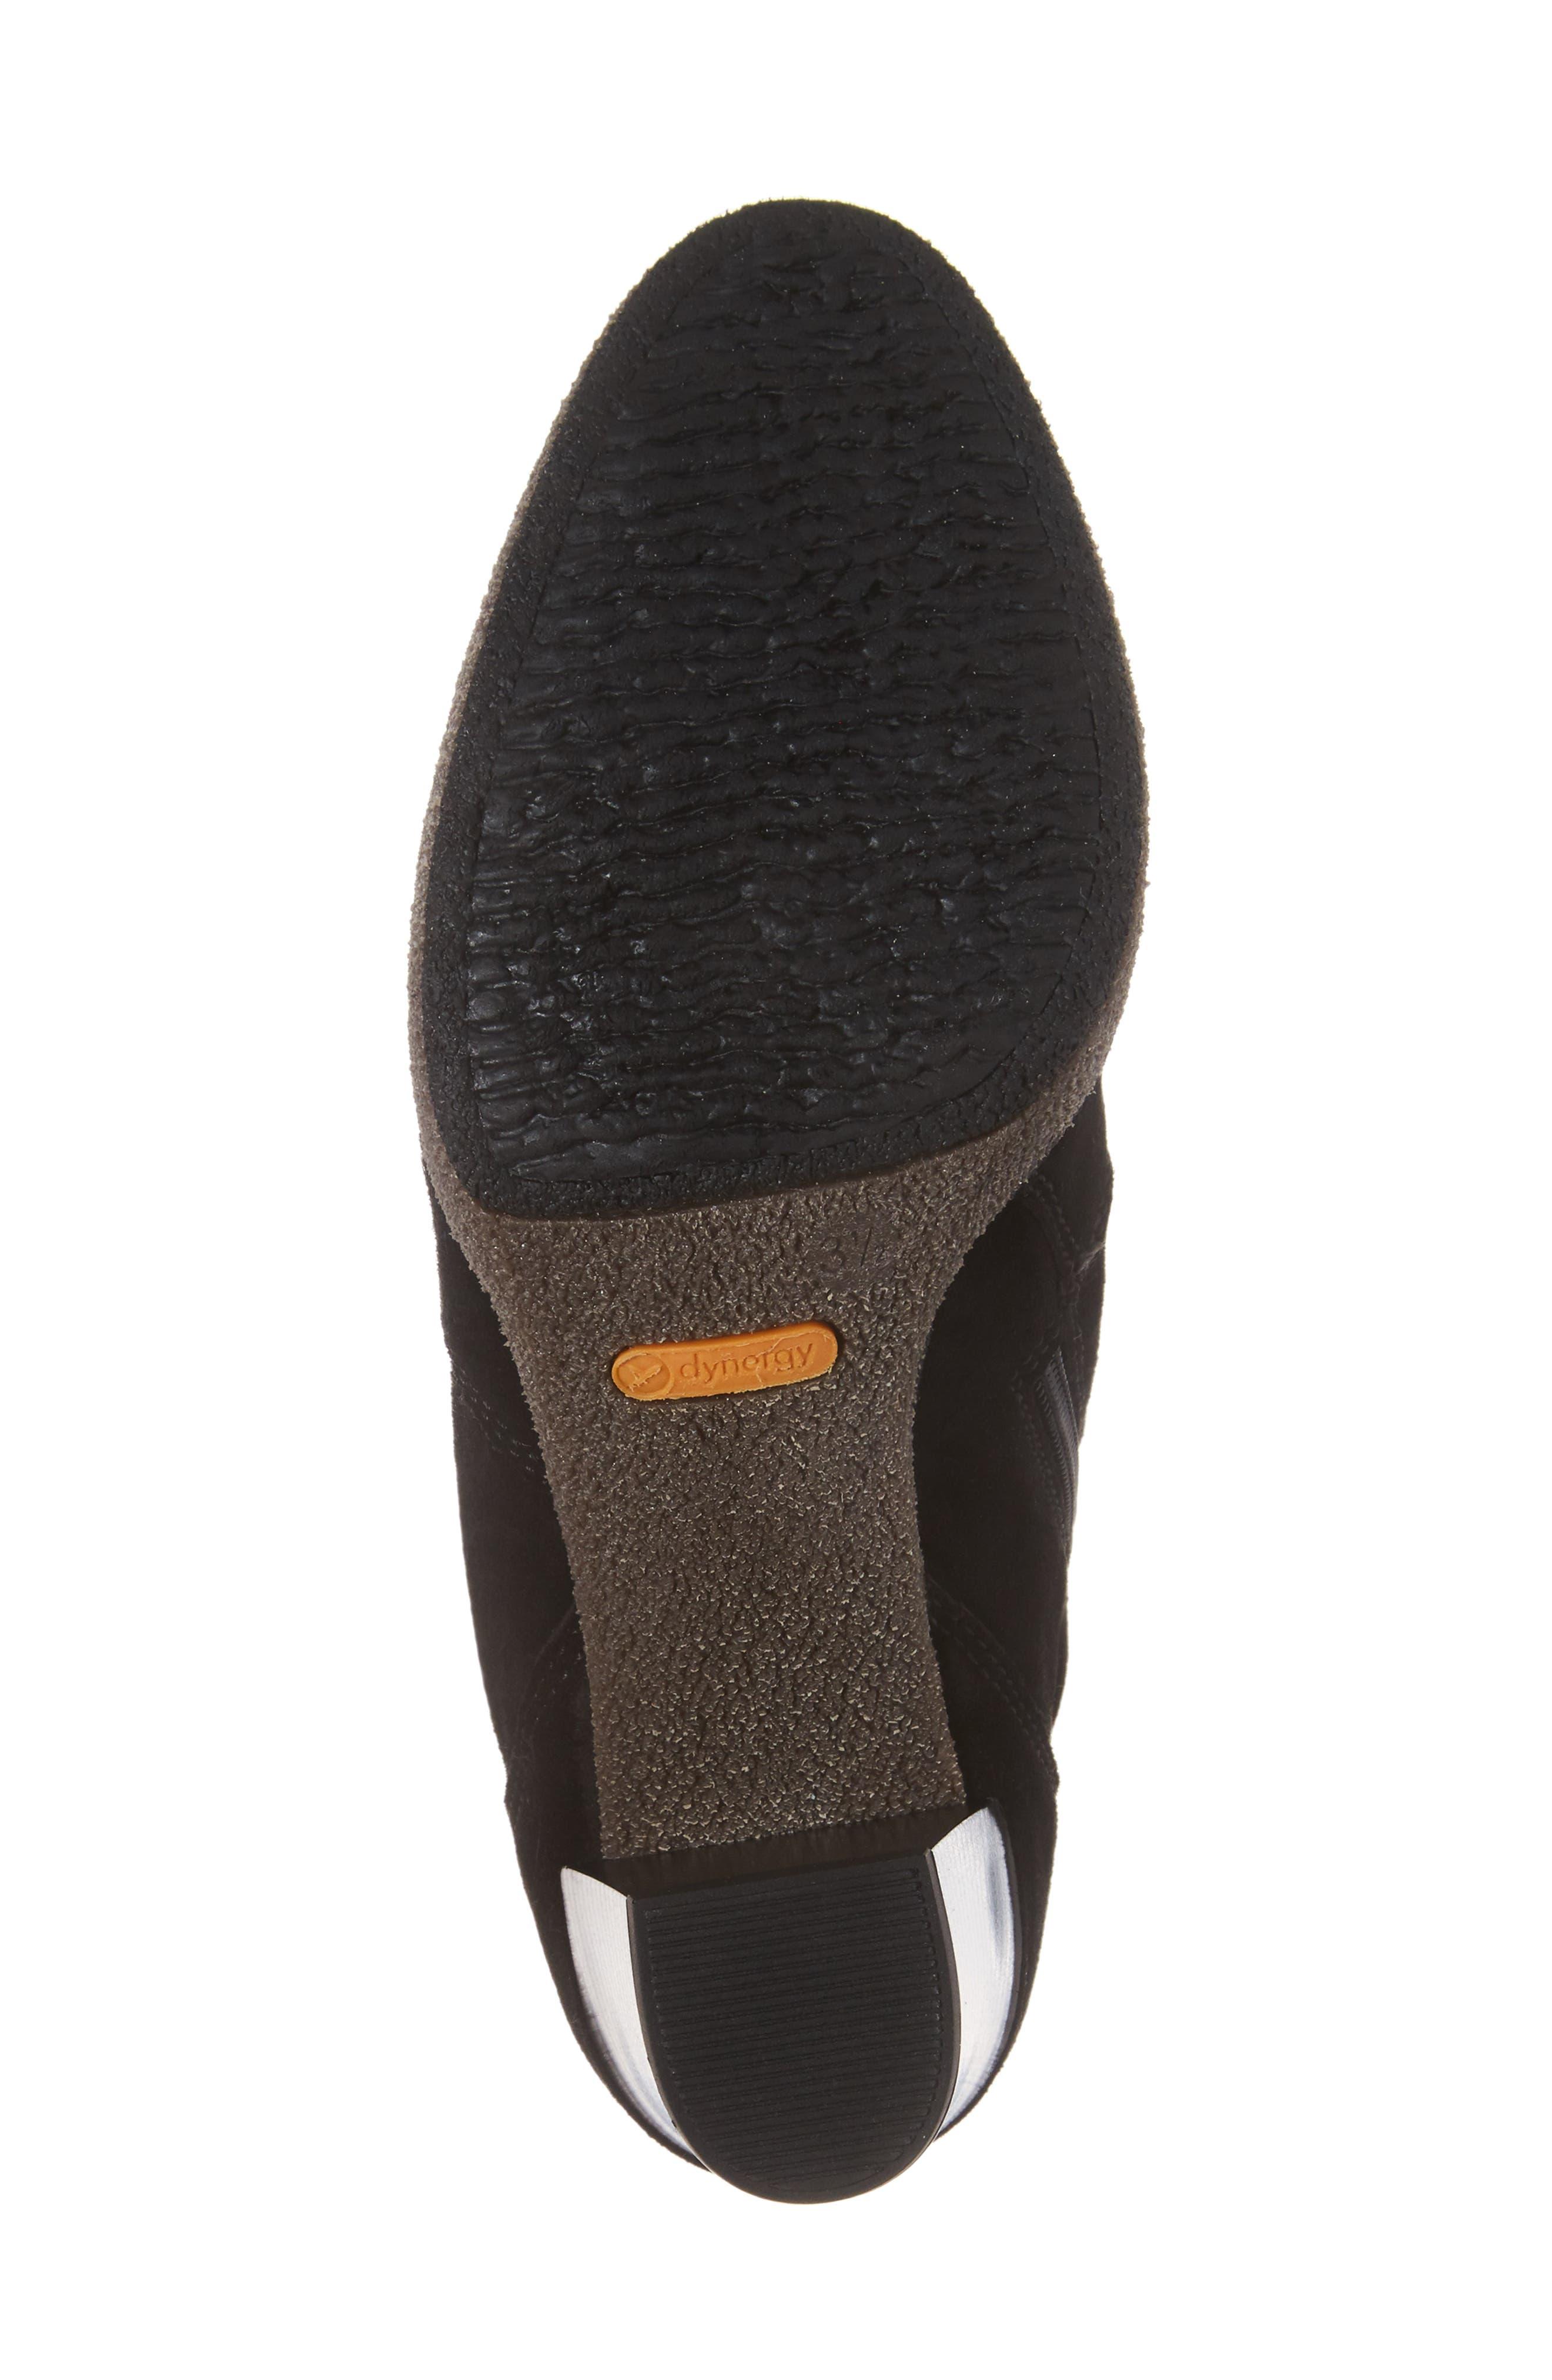 Bristol Bootie,                             Alternate thumbnail 6, color,                             Black Leather